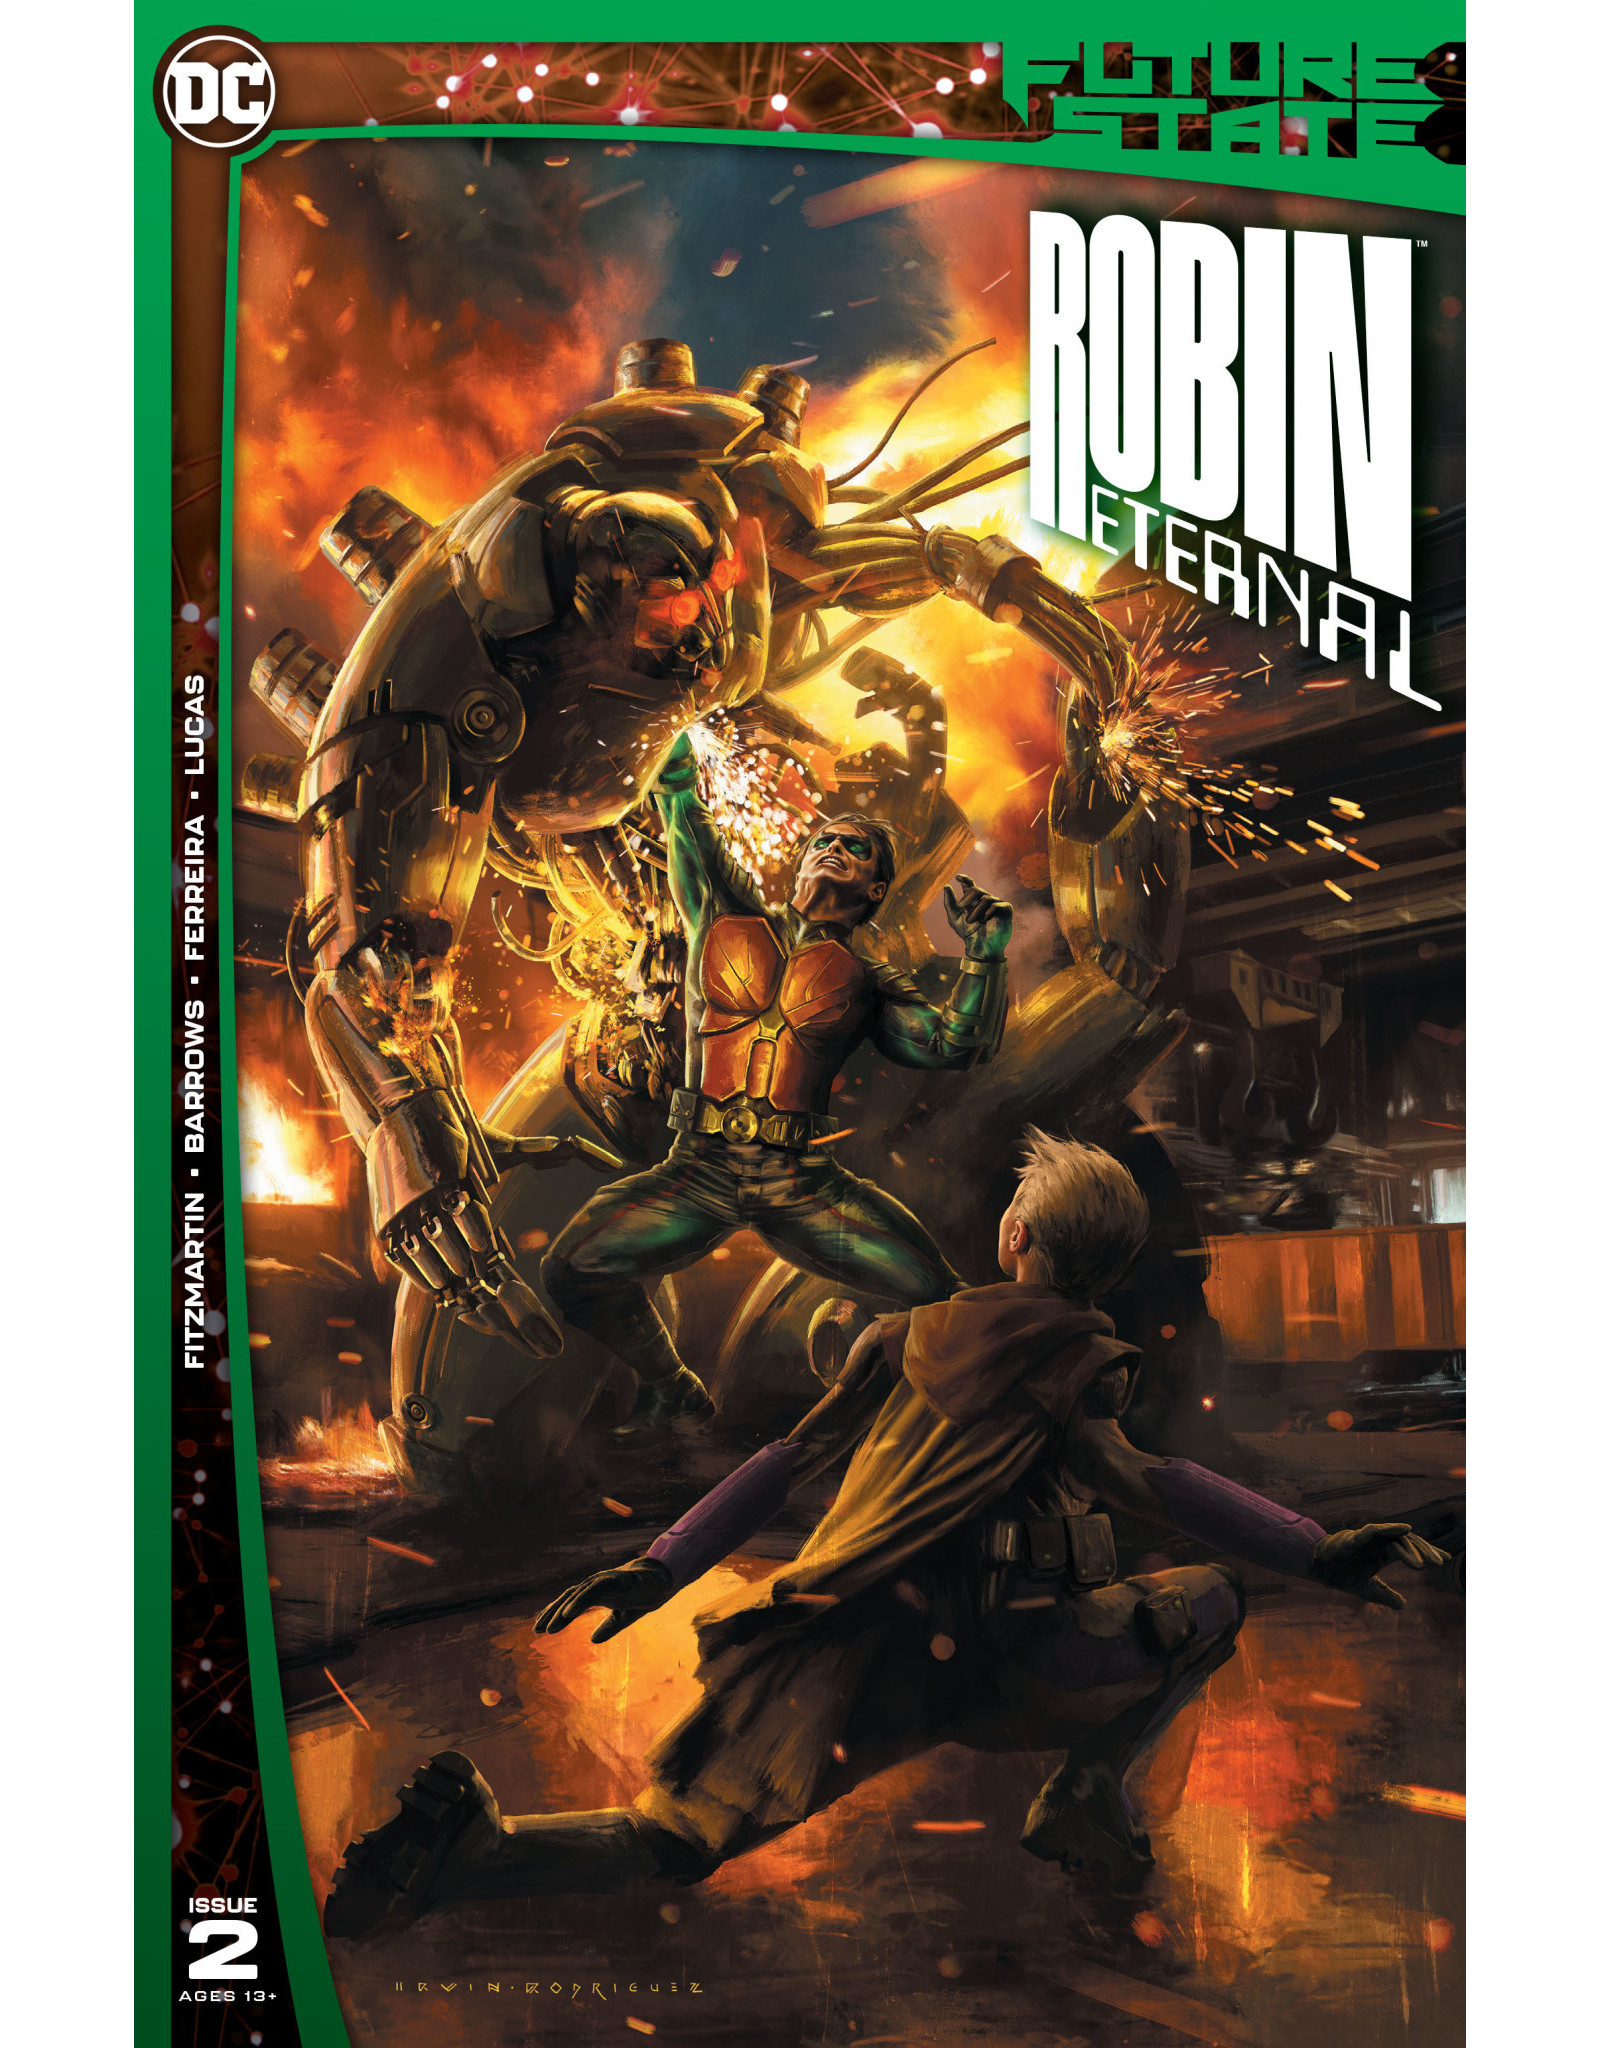 DC Comics FUTURE STATE ROBIN ETERNAL #2 (OF 2) CVR A EMANUELA LUPACCHINO & IRVIN RODRIGUEZ